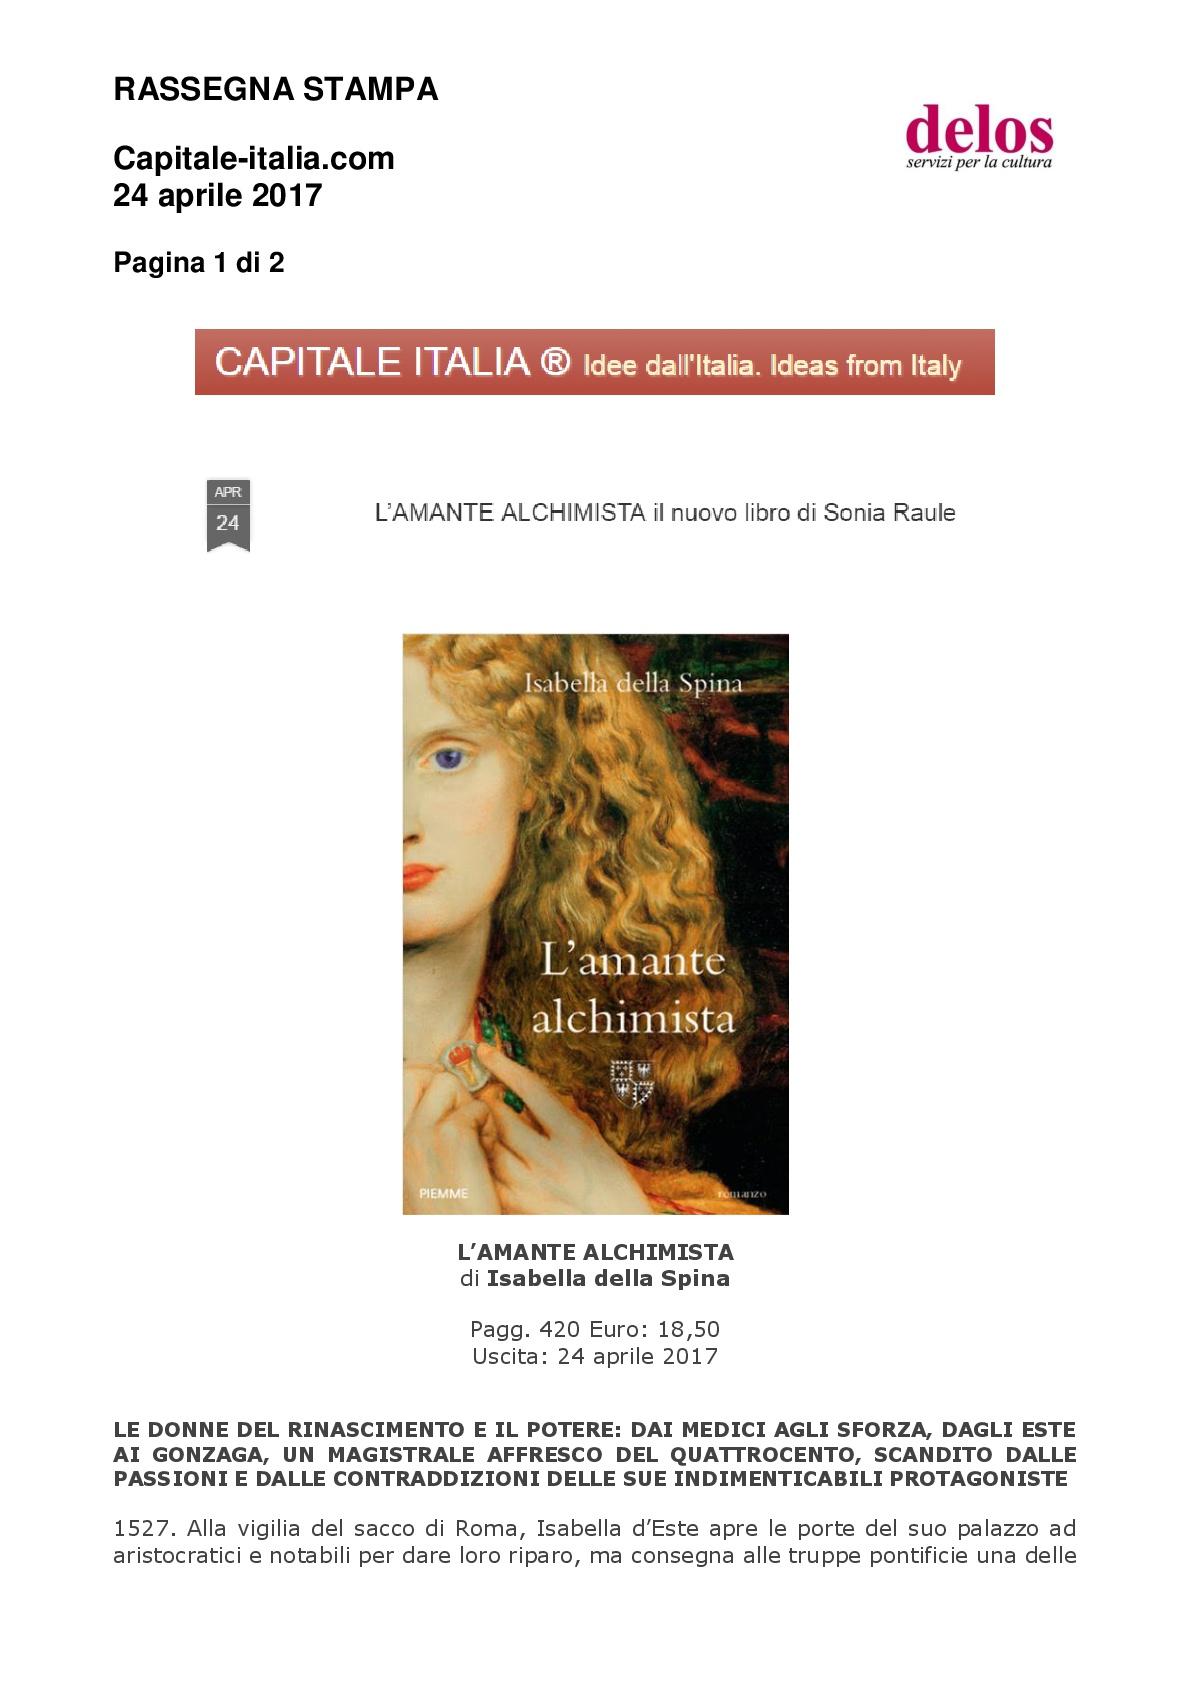 Capitaleitalia.com 24-04-2017 001